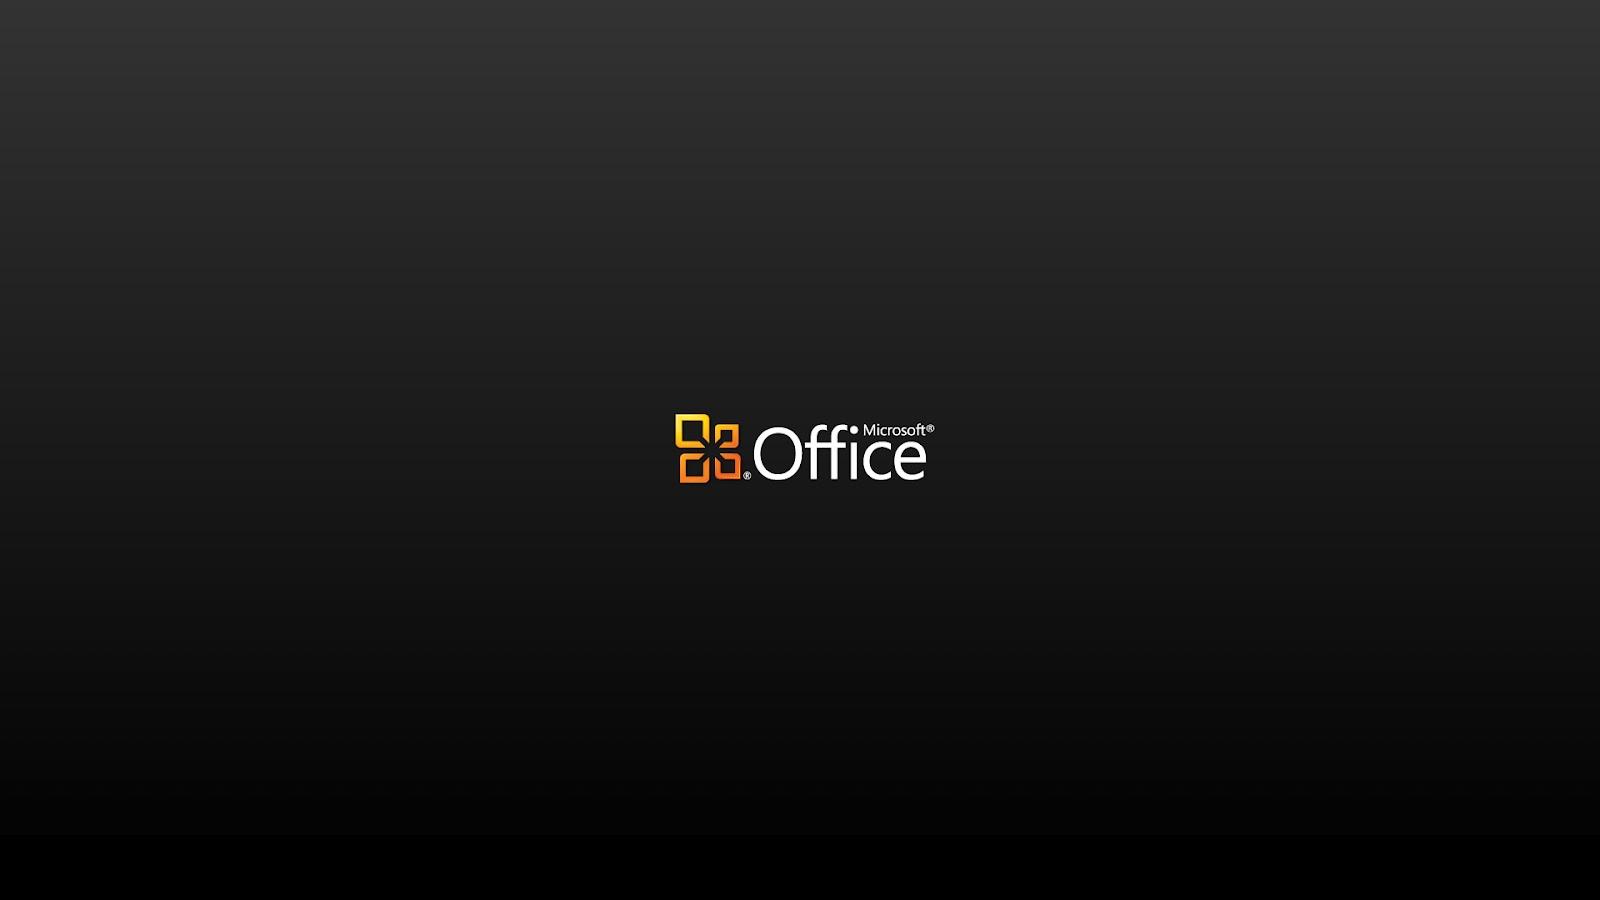 Microsoft Office Wallpaper 02